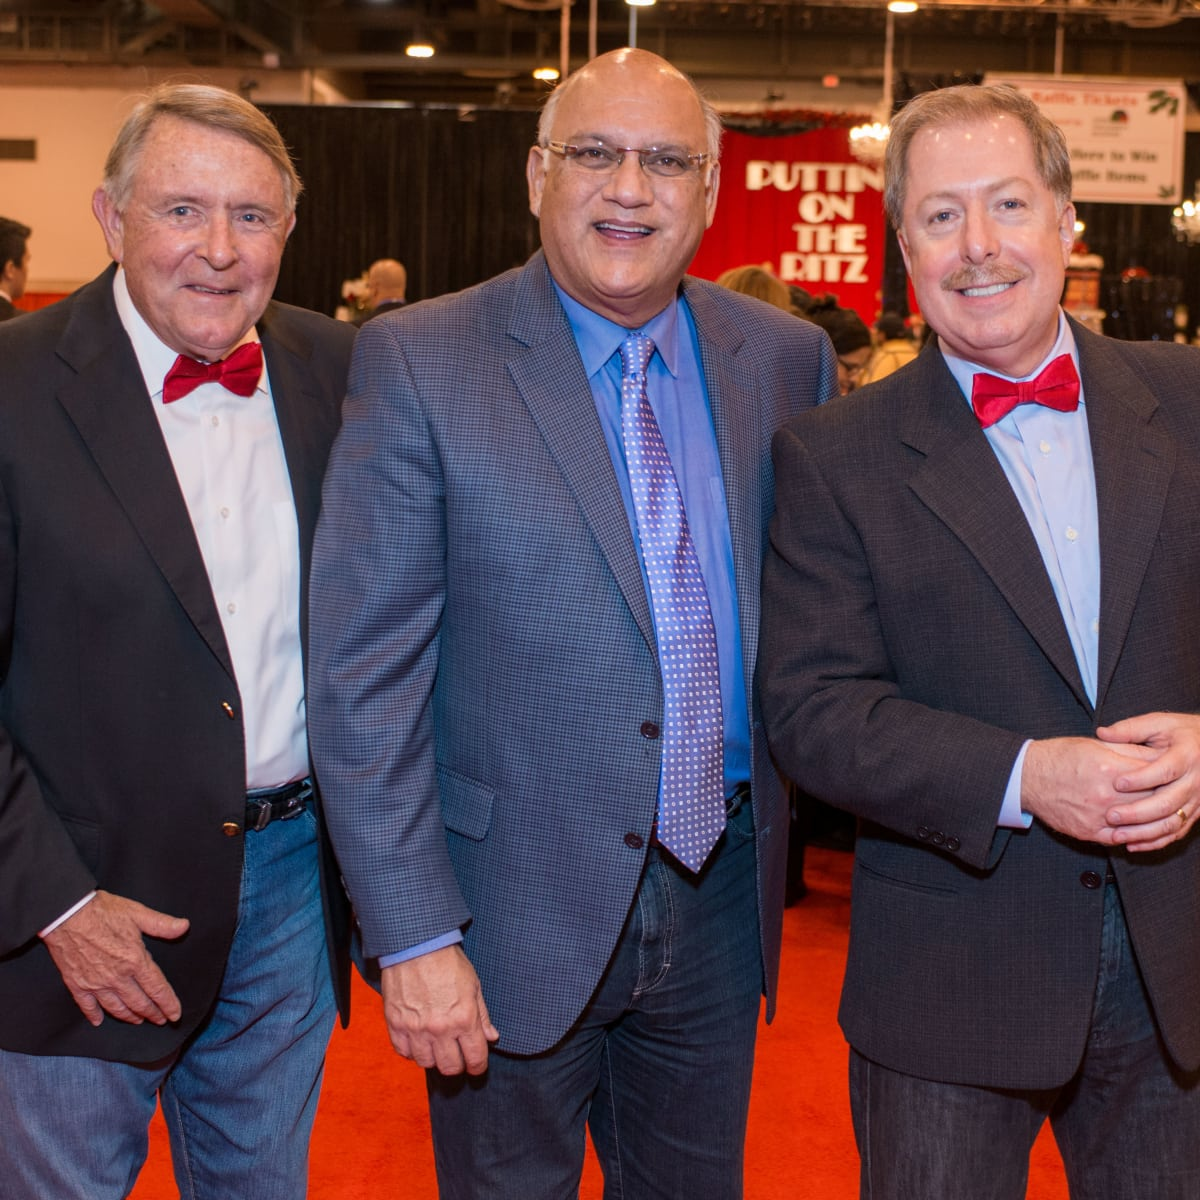 News, Shelby, Nutcracker Market, Nov. 2015, Don Gullquist, Dr. Fred Aguilar, Sam Malone